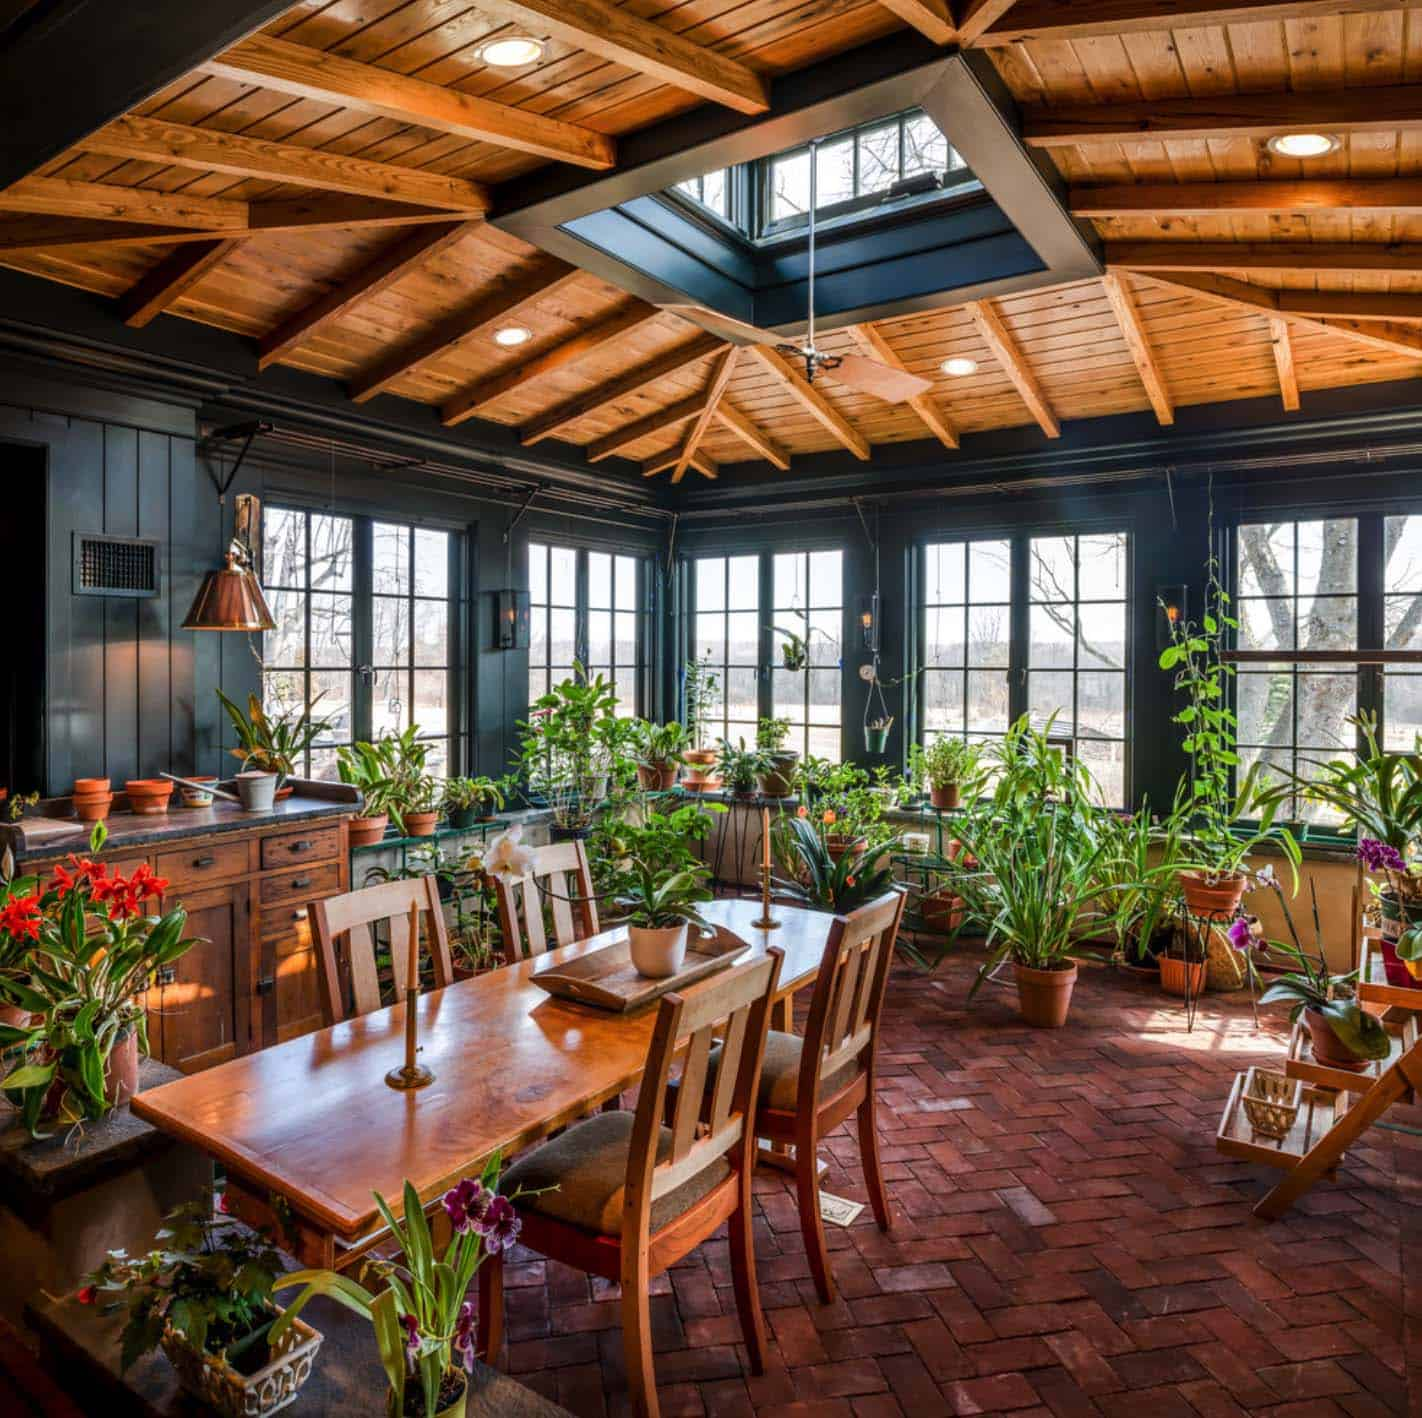 Amazing-Conservatory-Greenhouse-Ideas-23-1-Kindesign